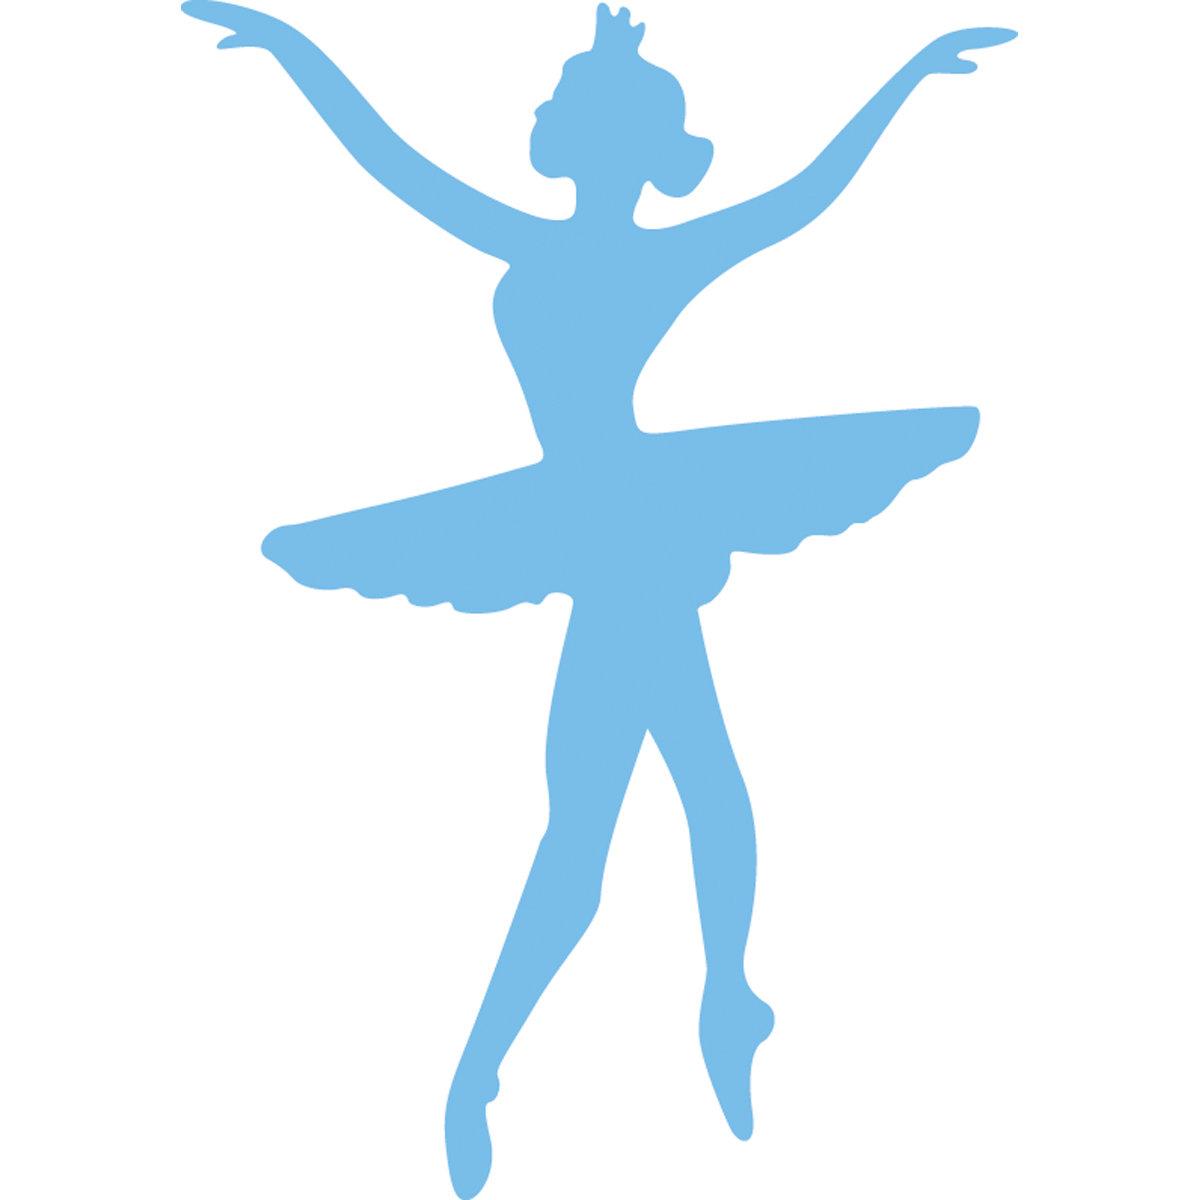 шаблон балерины из бумаги картинка